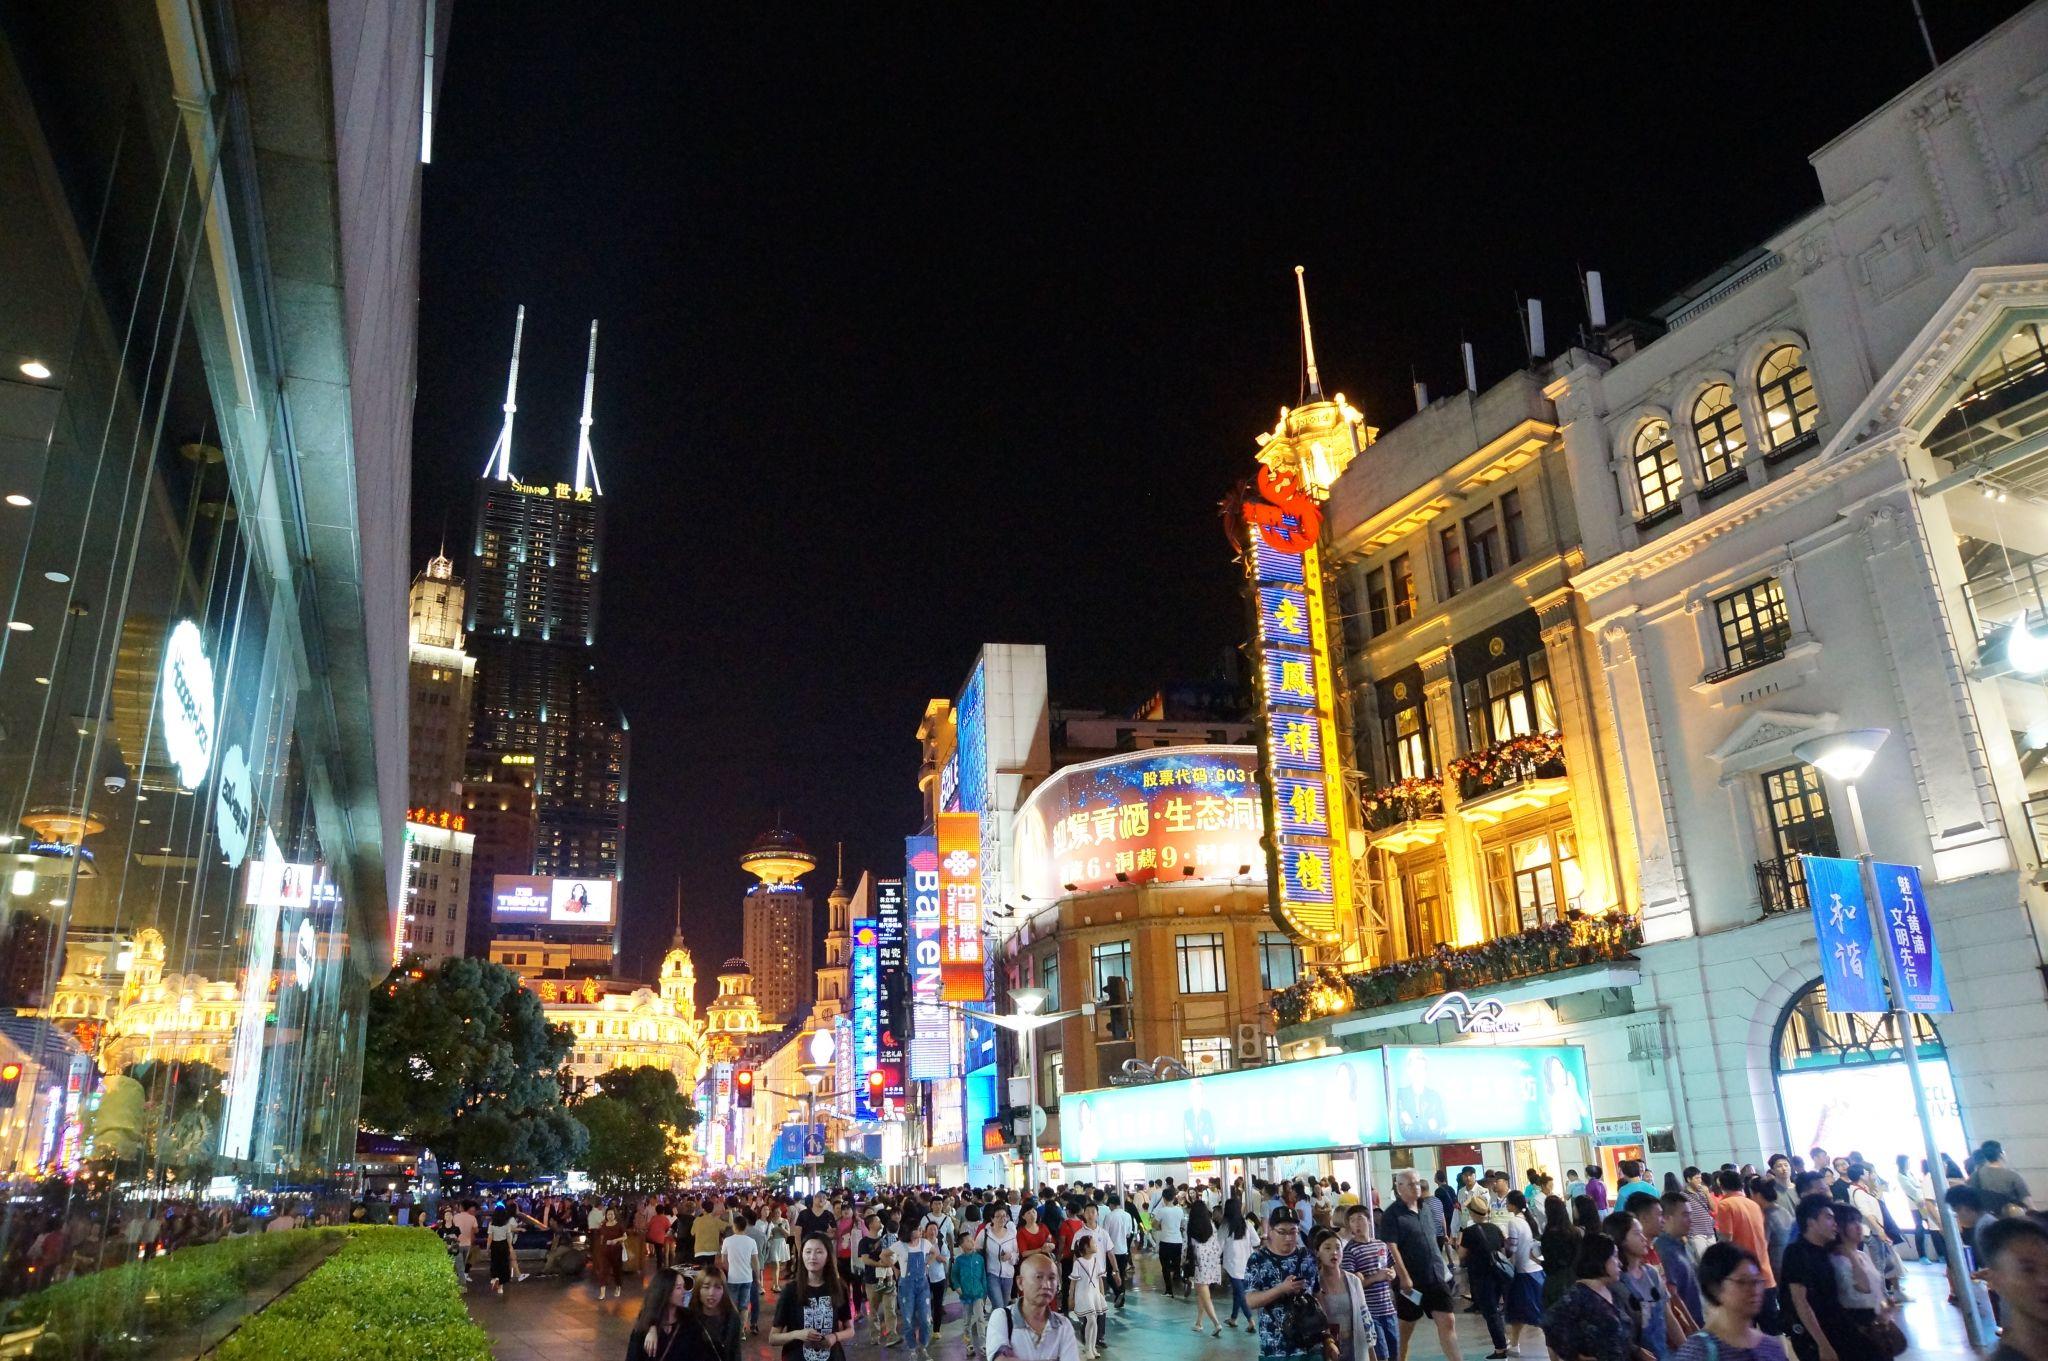 Nanjing Ru (Road), China